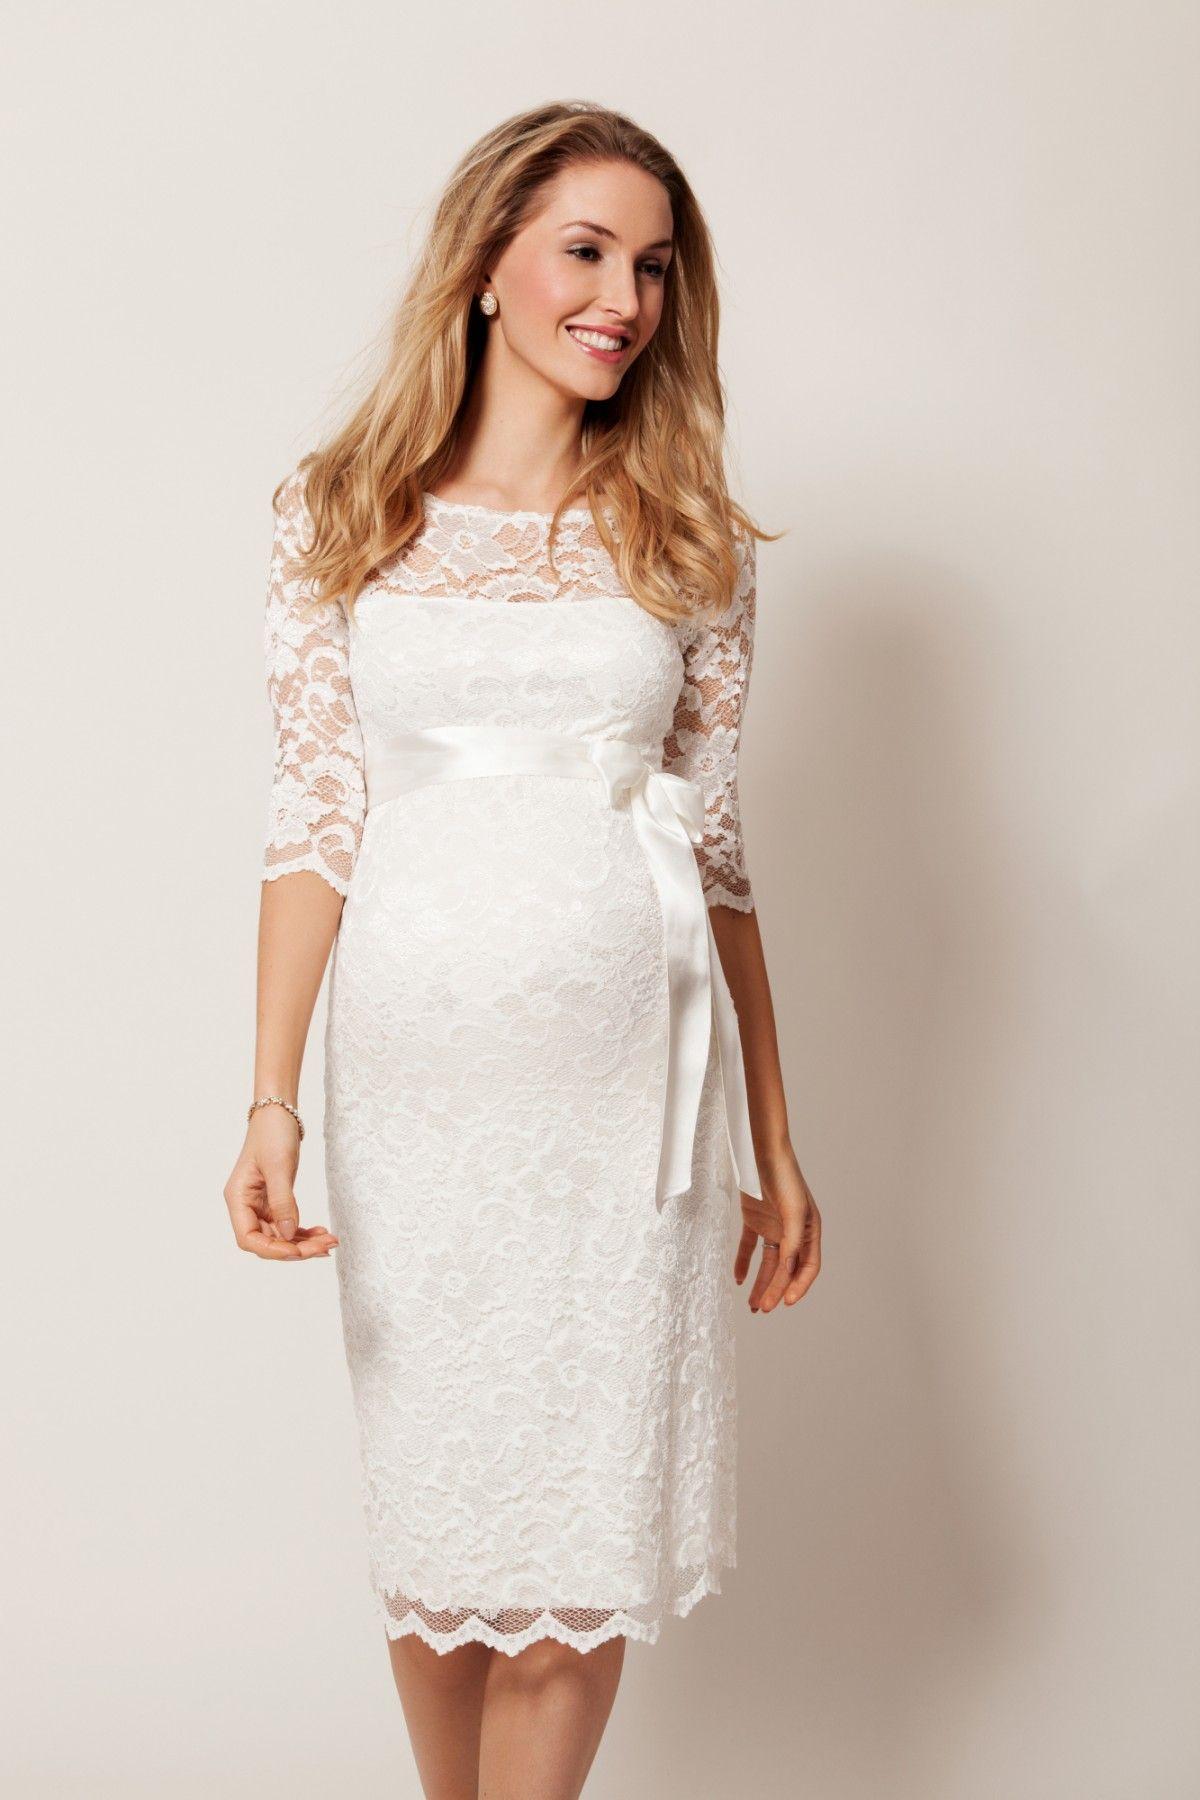 Zwangerschaps trouwjurk tiffany rose amelia stefanie pinterest amelia lace maternity wedding dress short ivory by tiffany rose ombrellifo Gallery